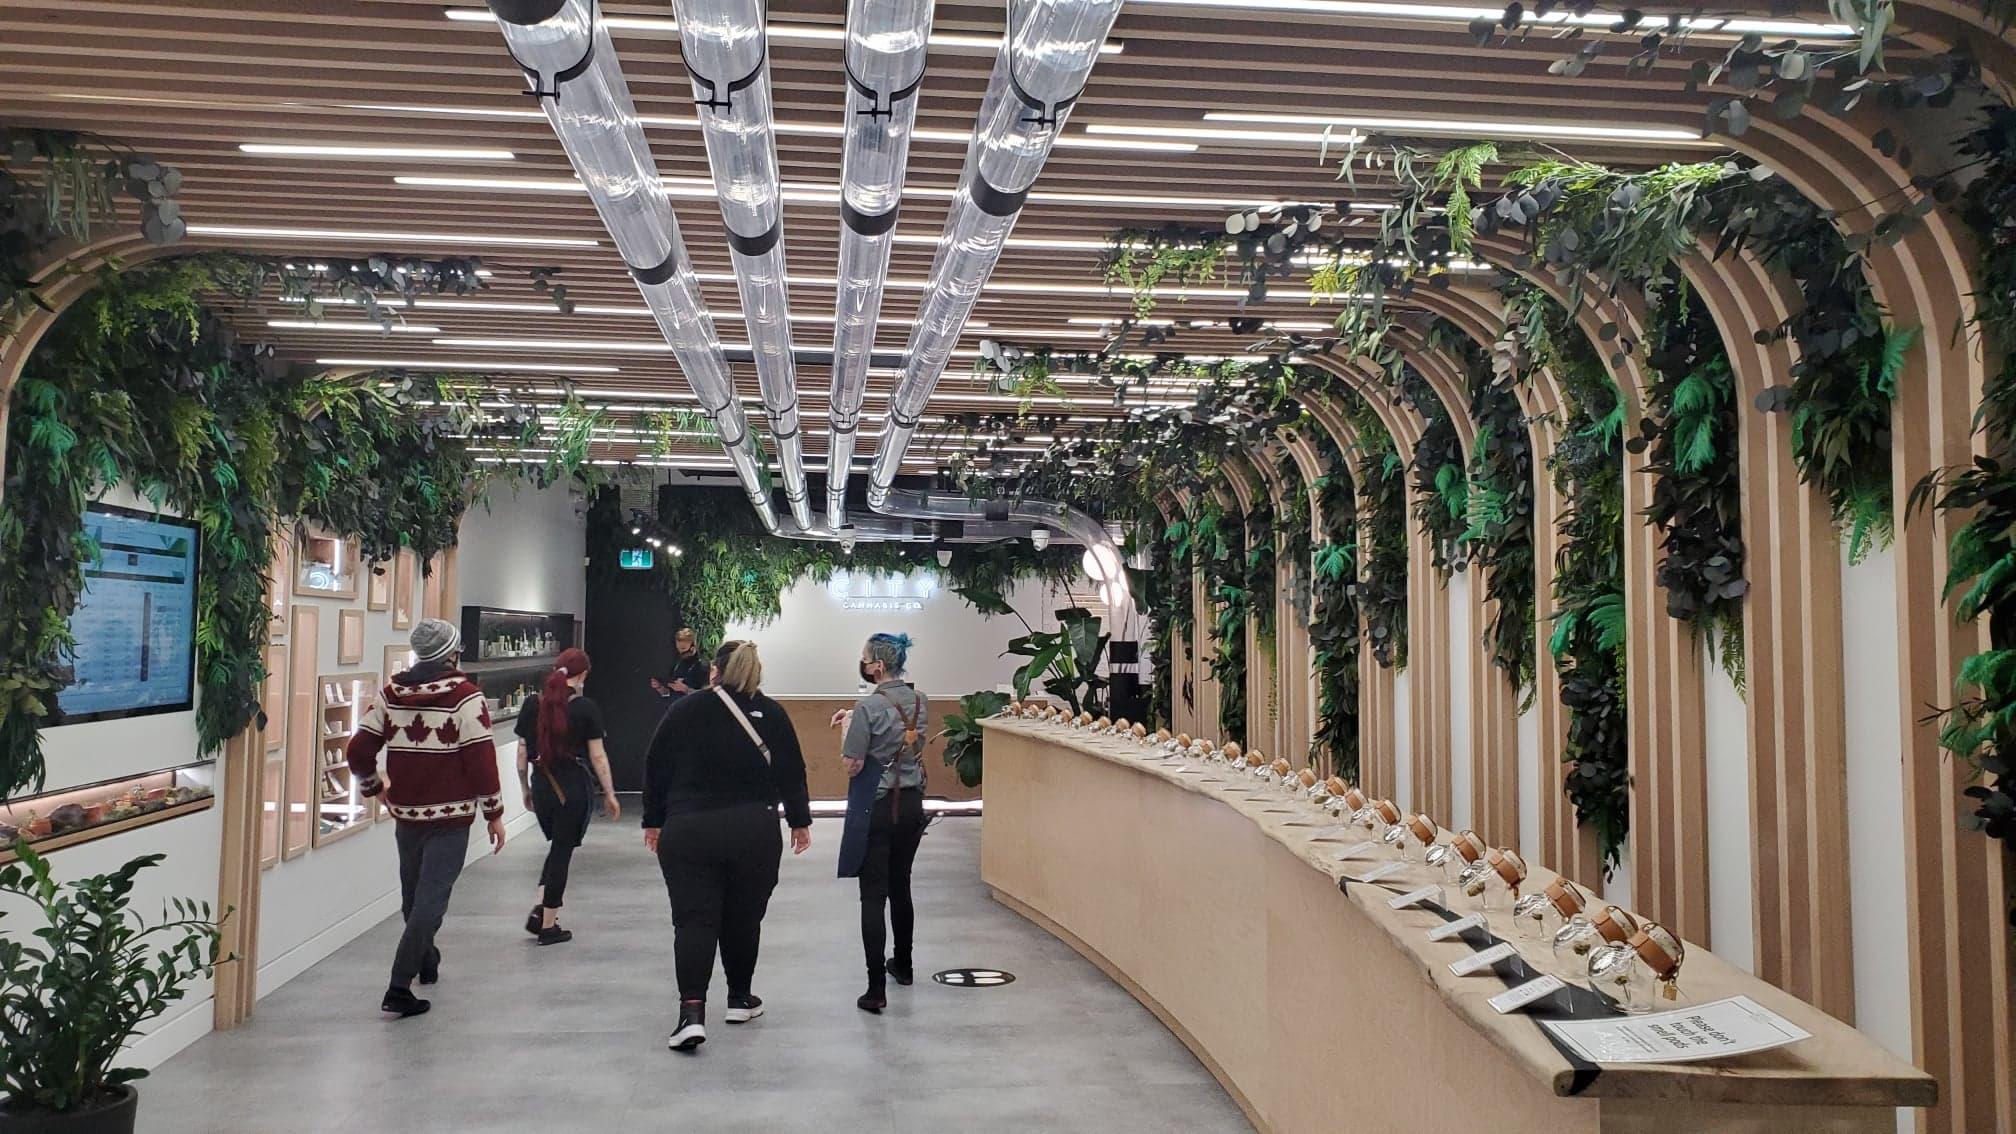 4/20 weed sales rebound 8% in North America: Cova